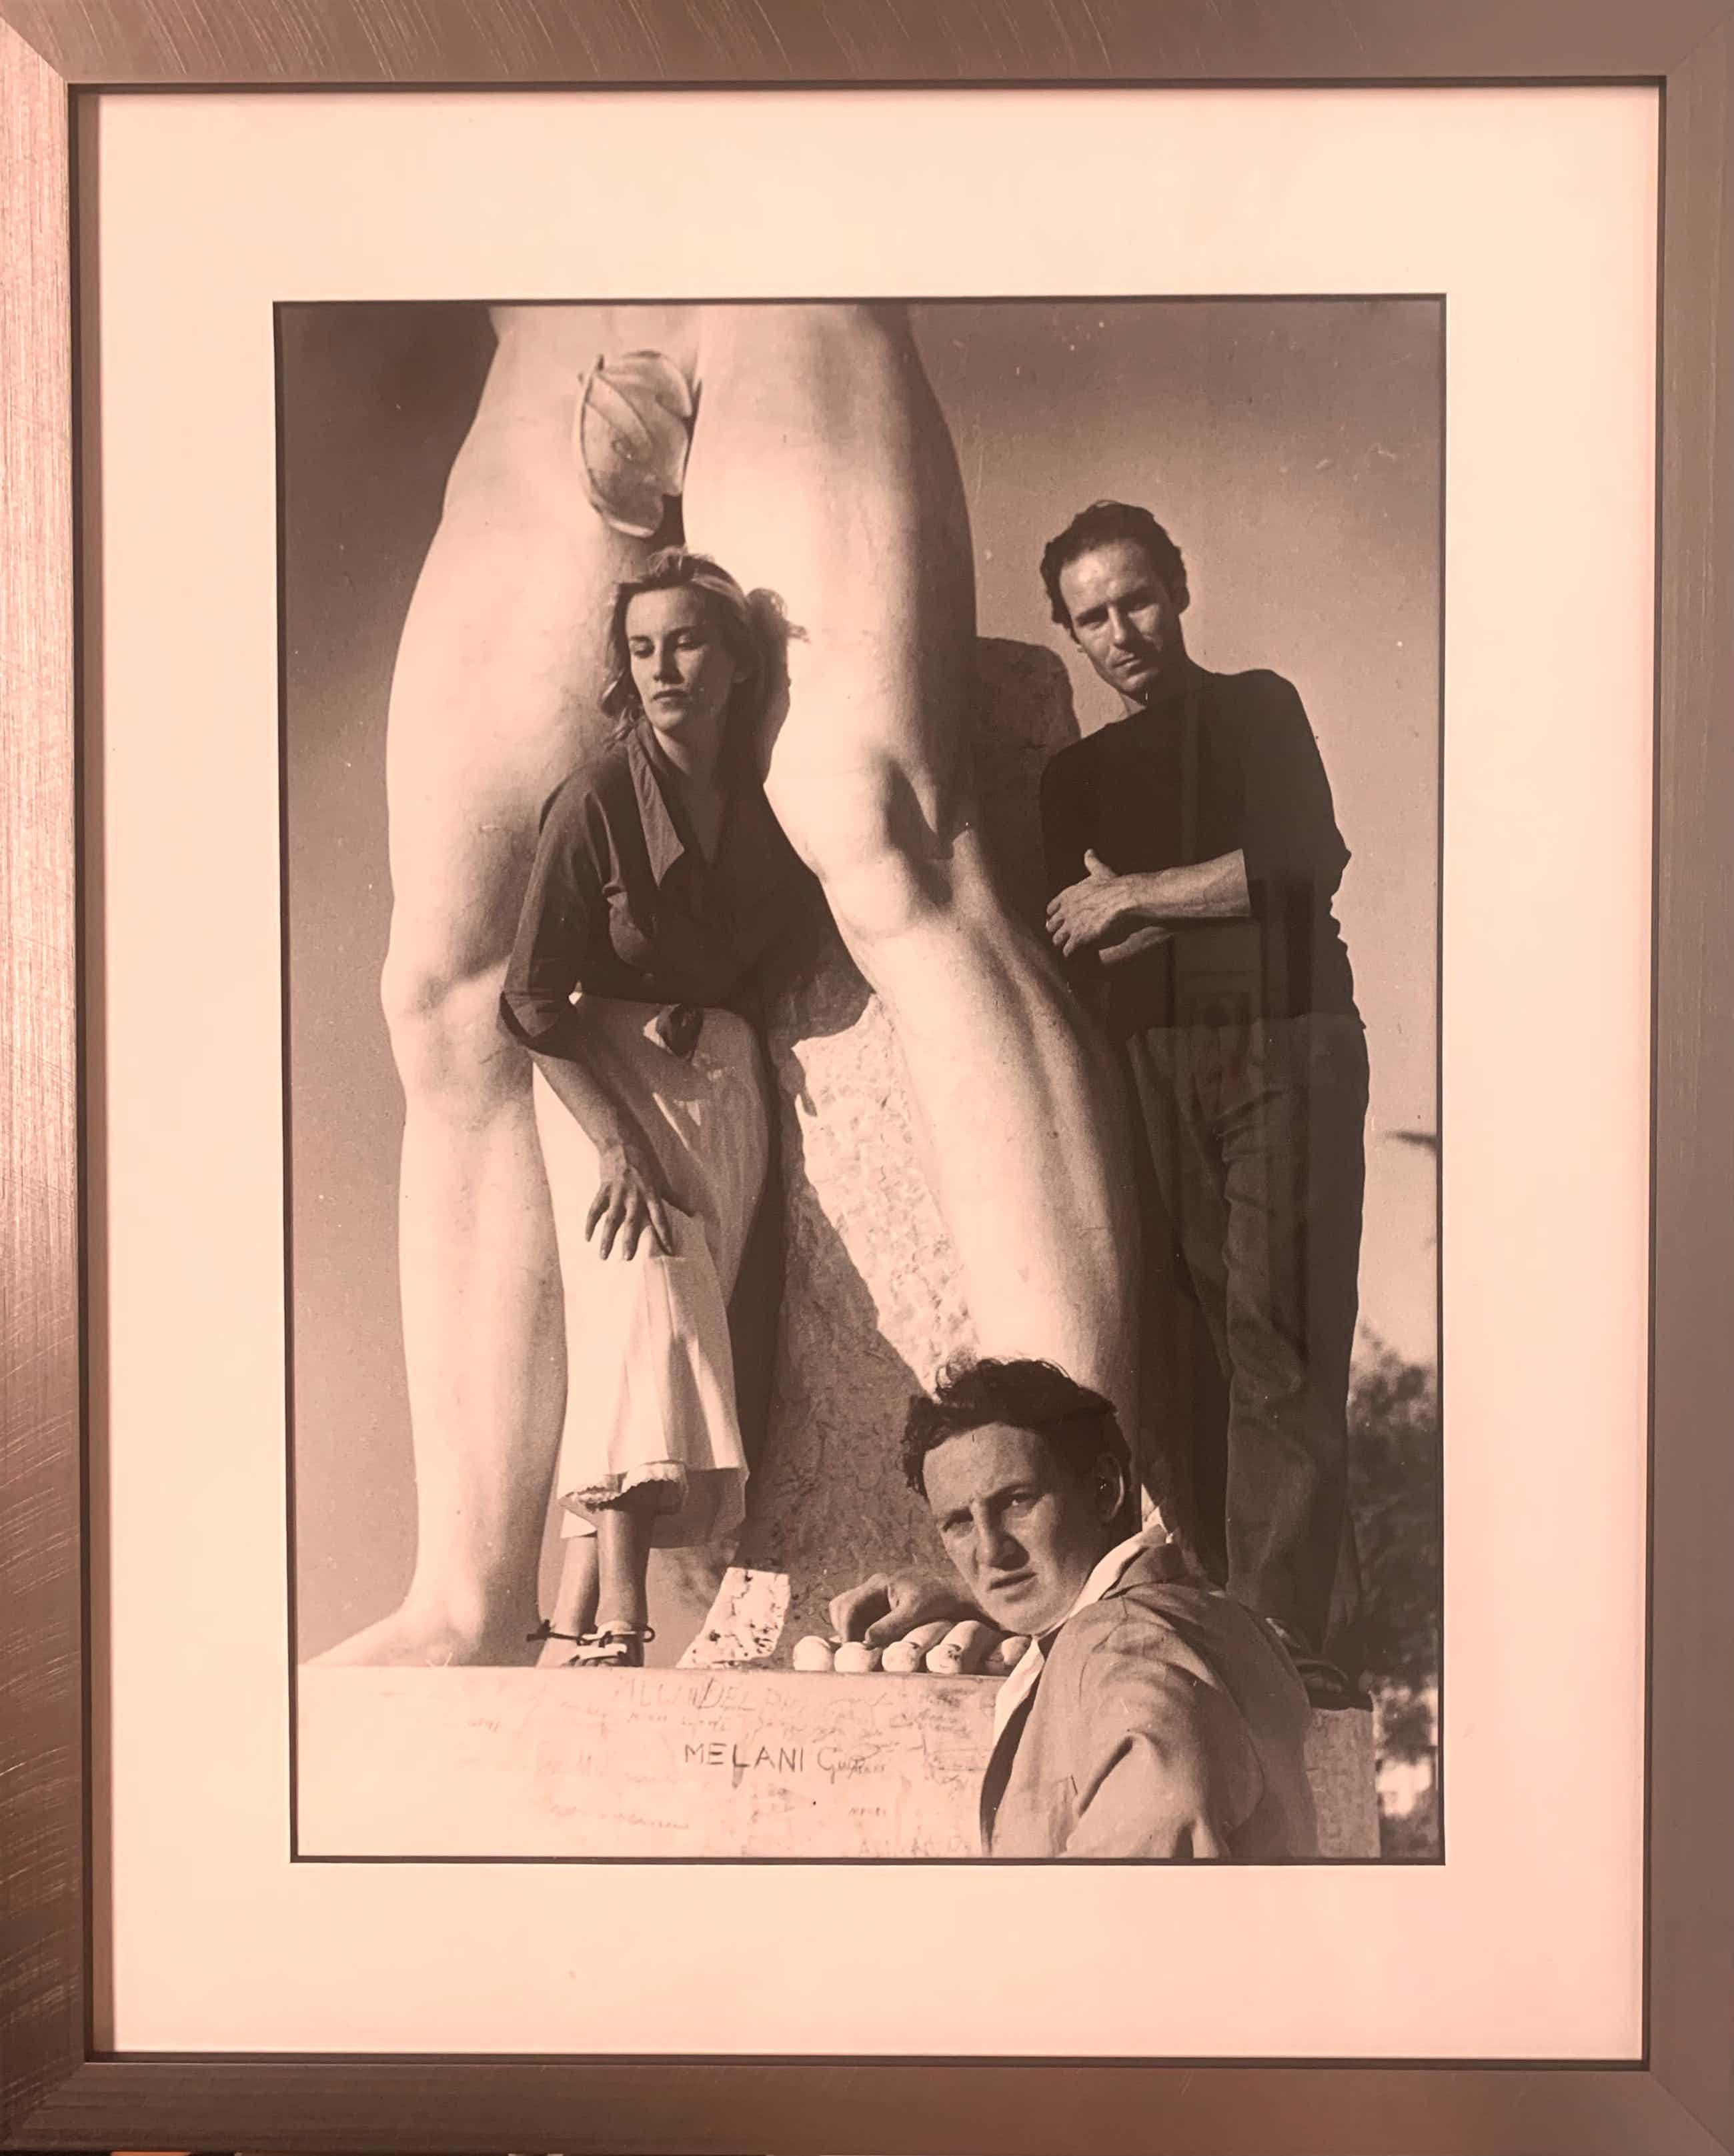 Henny Riemens - Melani's Hallo. Elly Claus, Hugo Claus en Corneille in Rome , 1954 kopen? Bied vanaf 450!